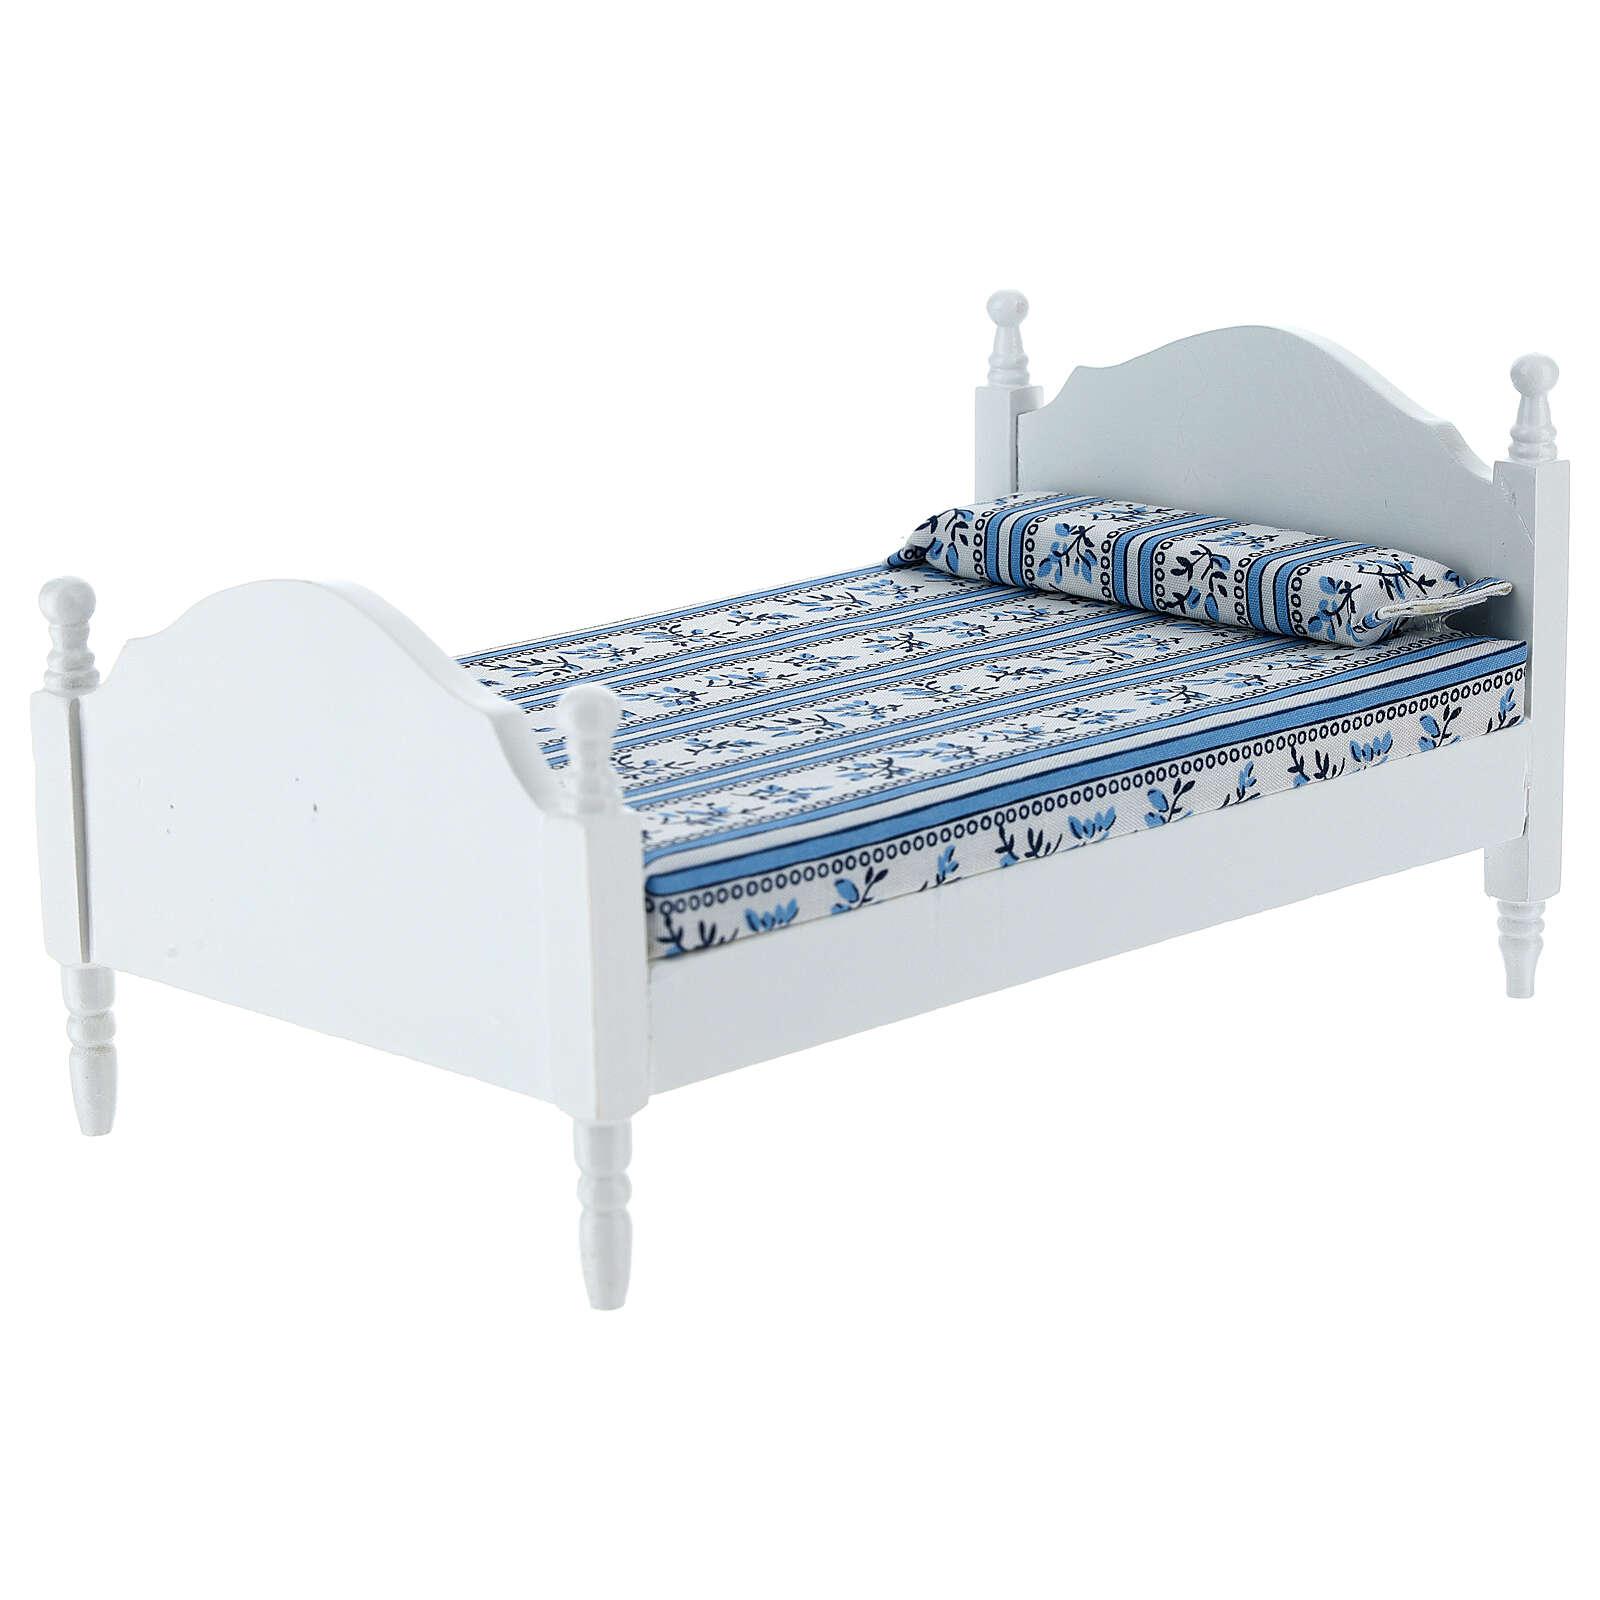 White bed with blanket Nativity scene 16 cm 4